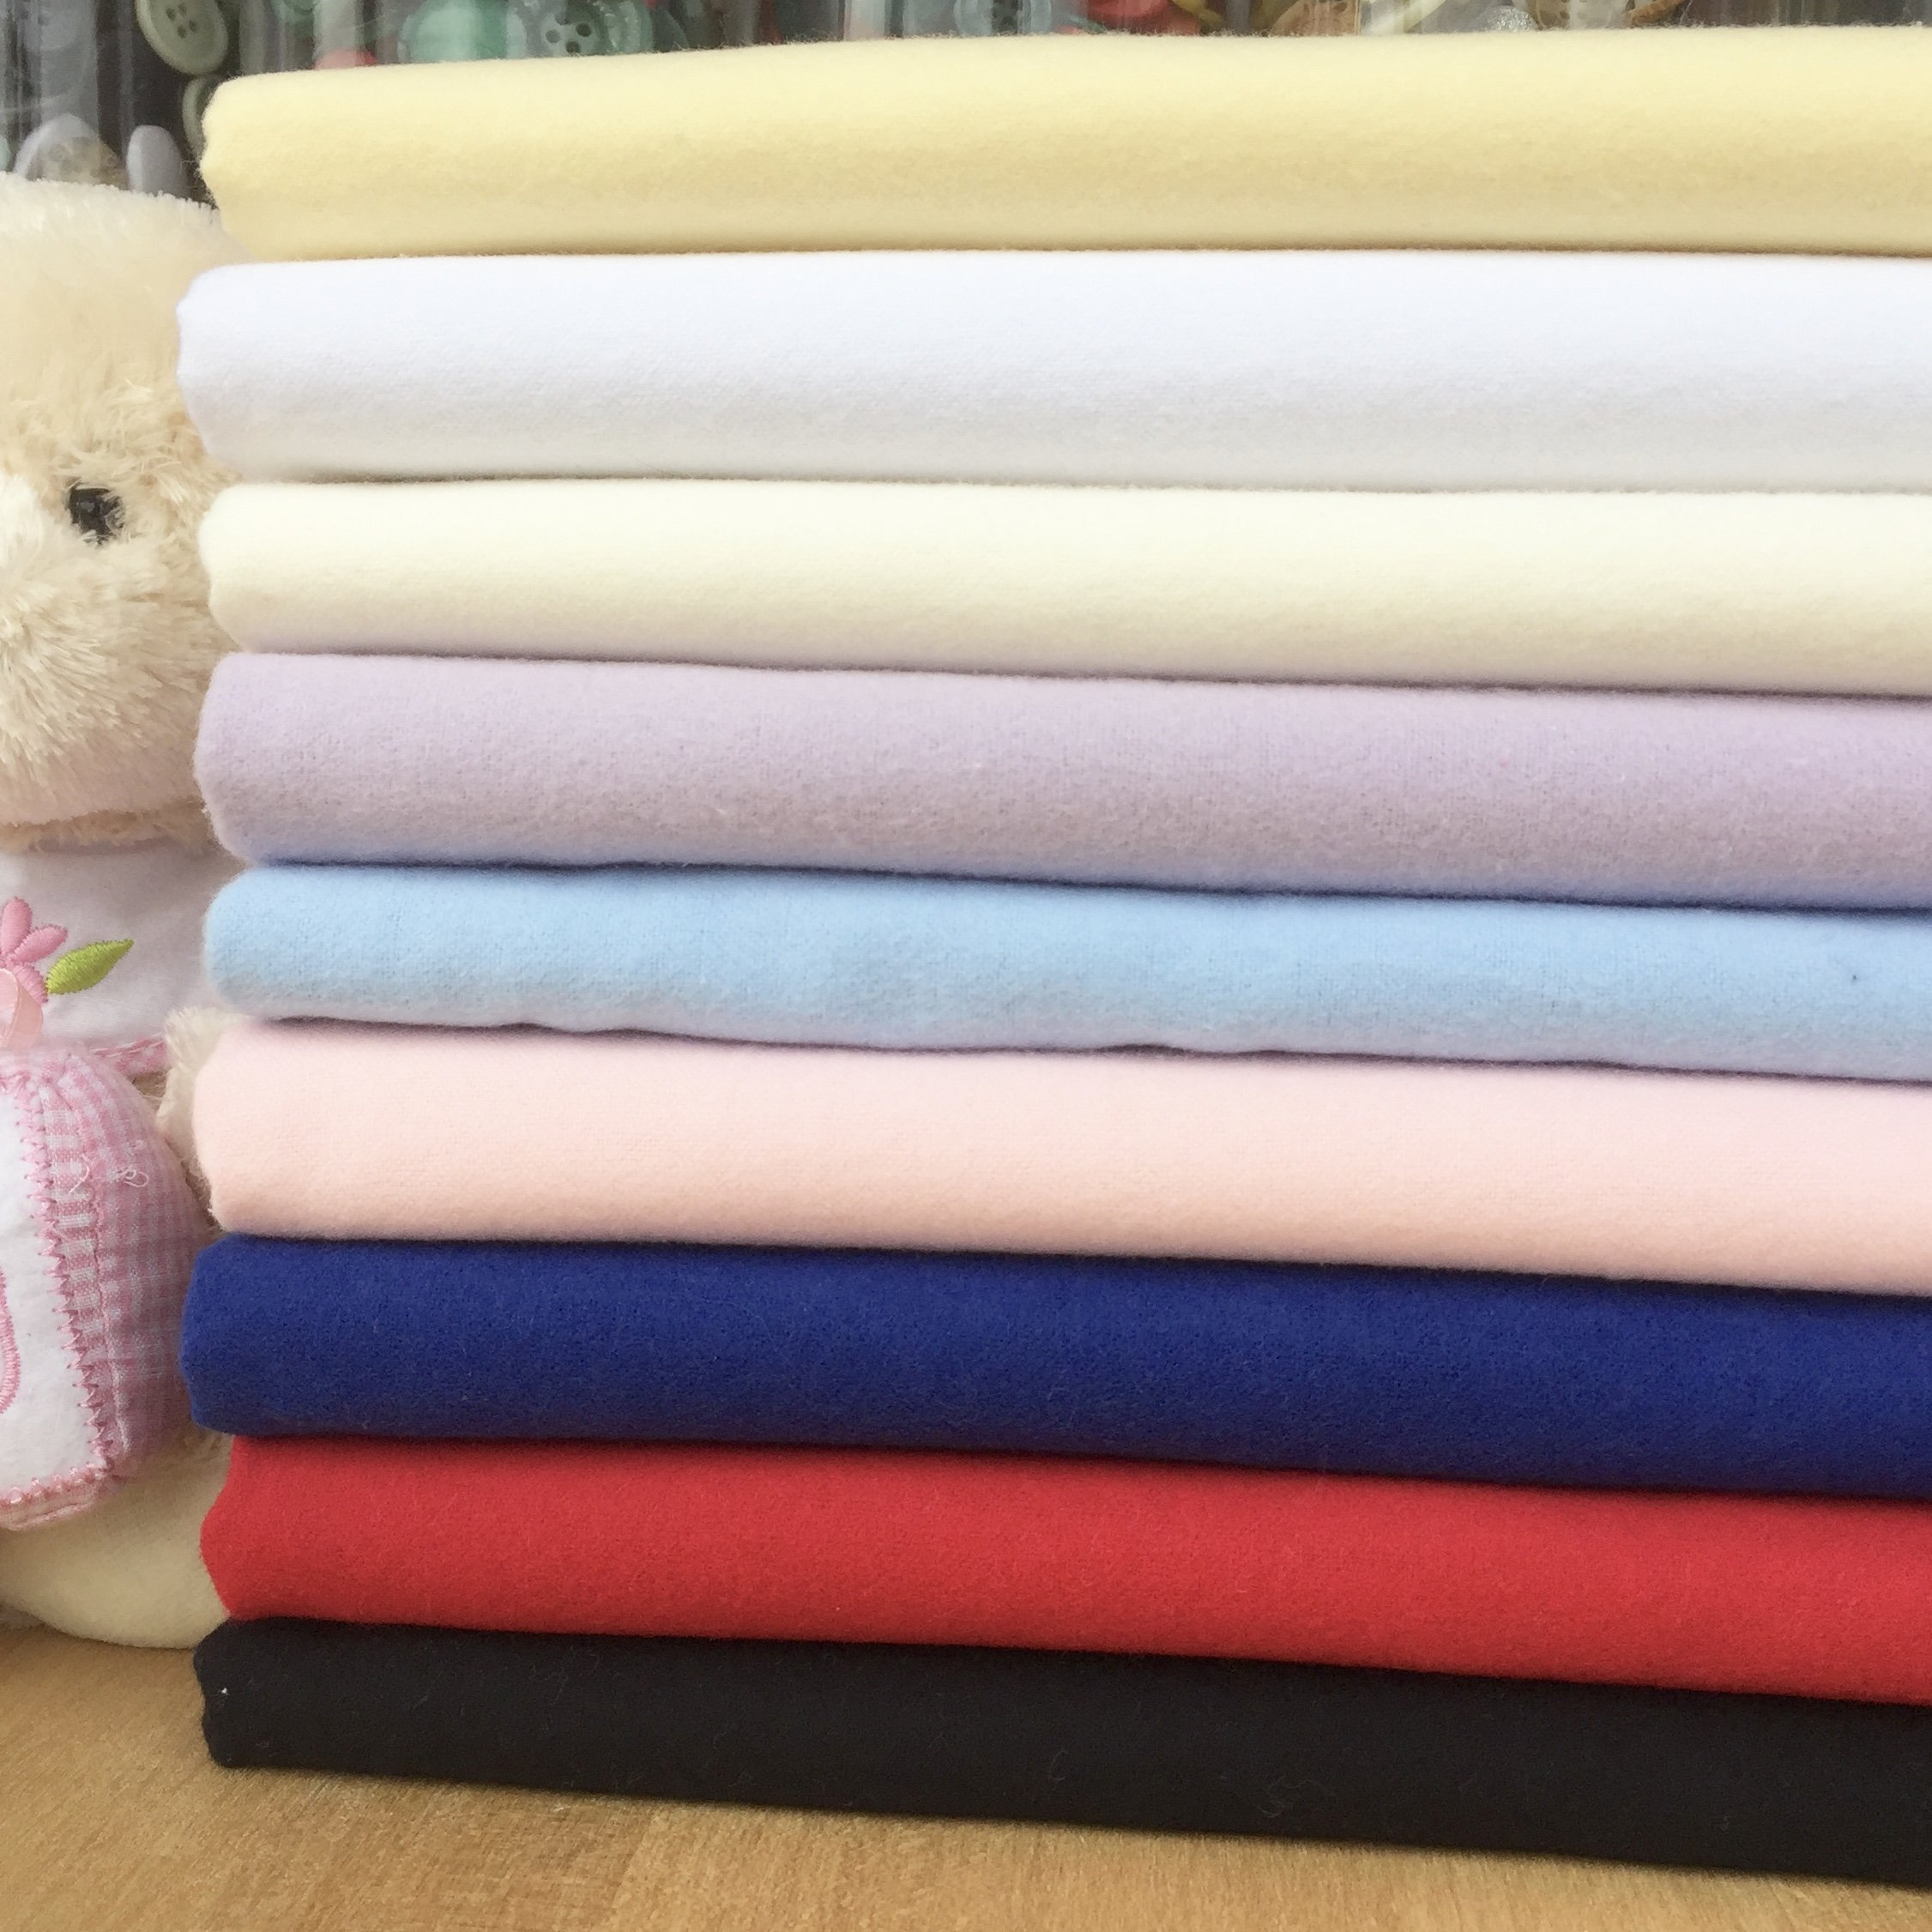 fabric by metre Bedding fabric custom printed Cotton Fabric Cotton FABRIC CHOICE HOLOGRAPHIC